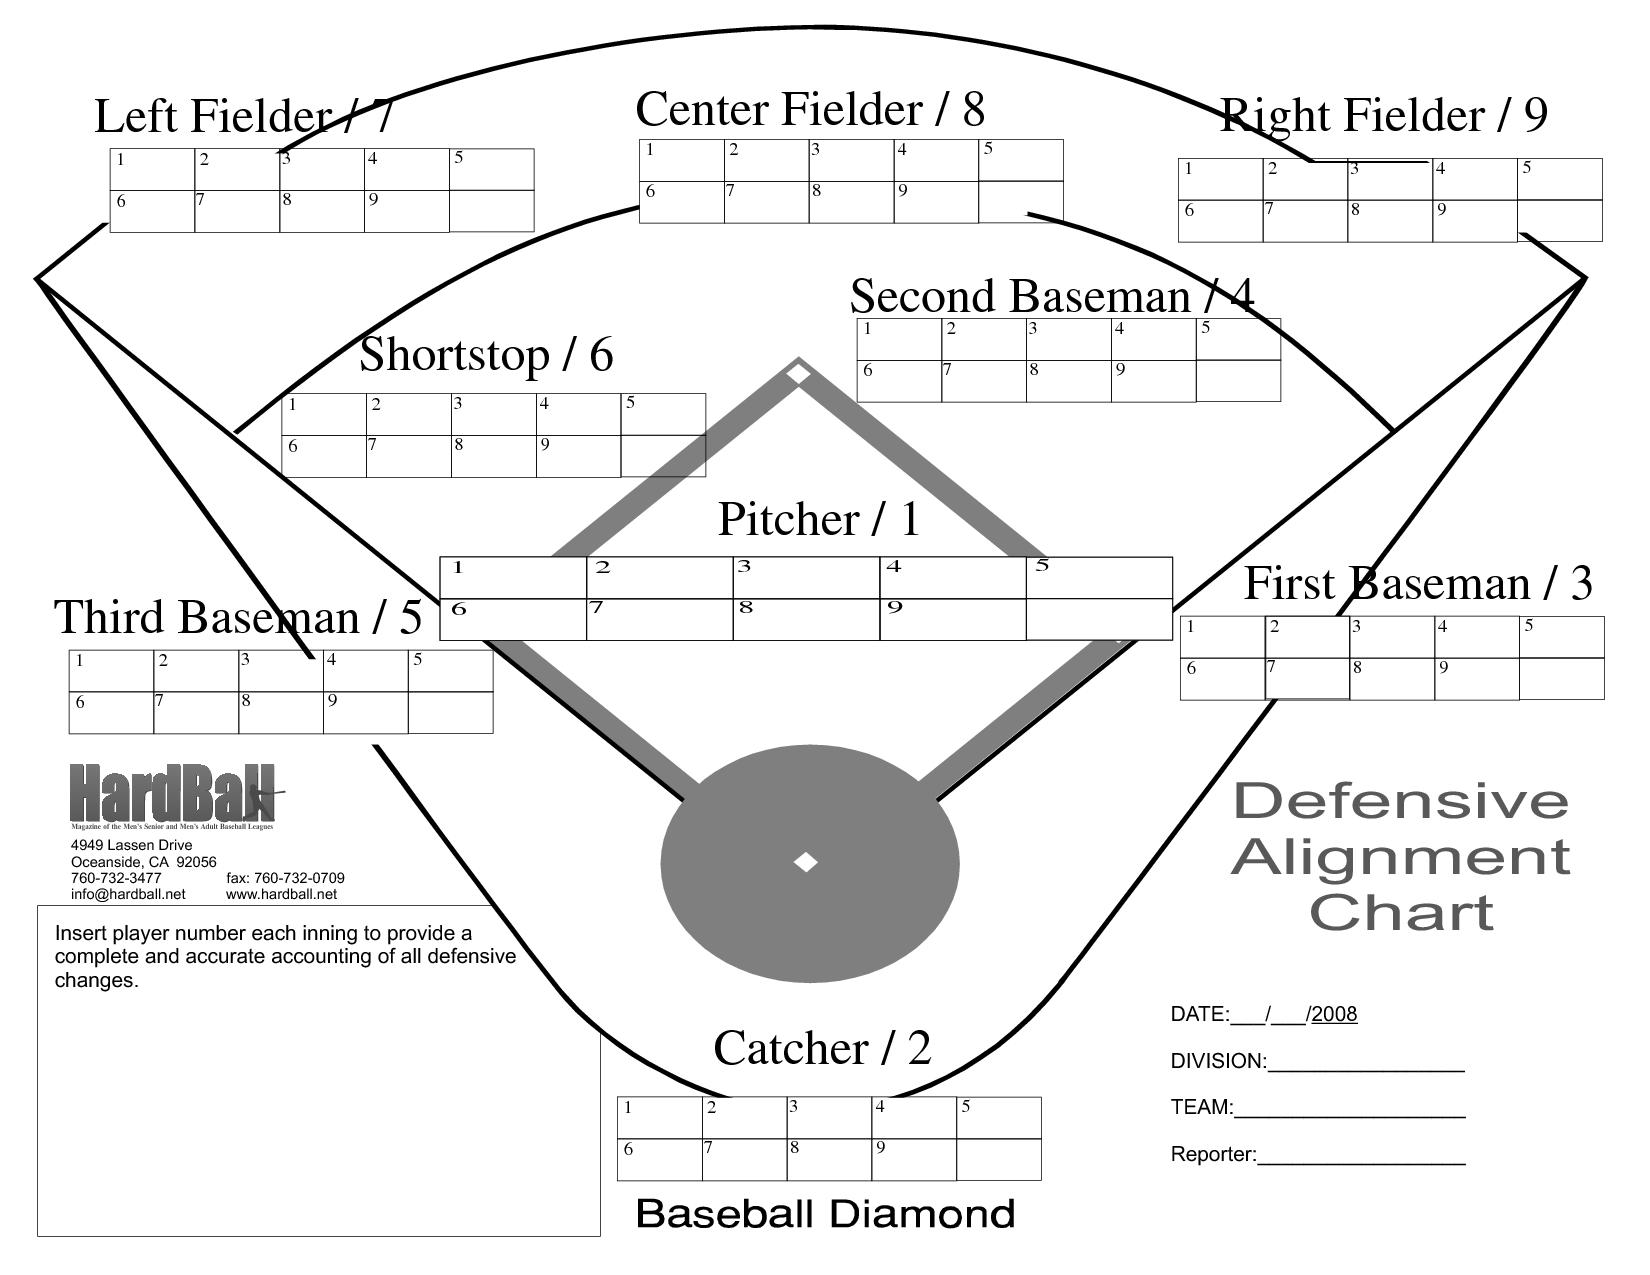 New Youth Baseball Lineup Template Exceltemplate Xls Xlstemplate Xlsformat Excelformat Microsoftexcel Depth Chart Baseball Lineup Chart